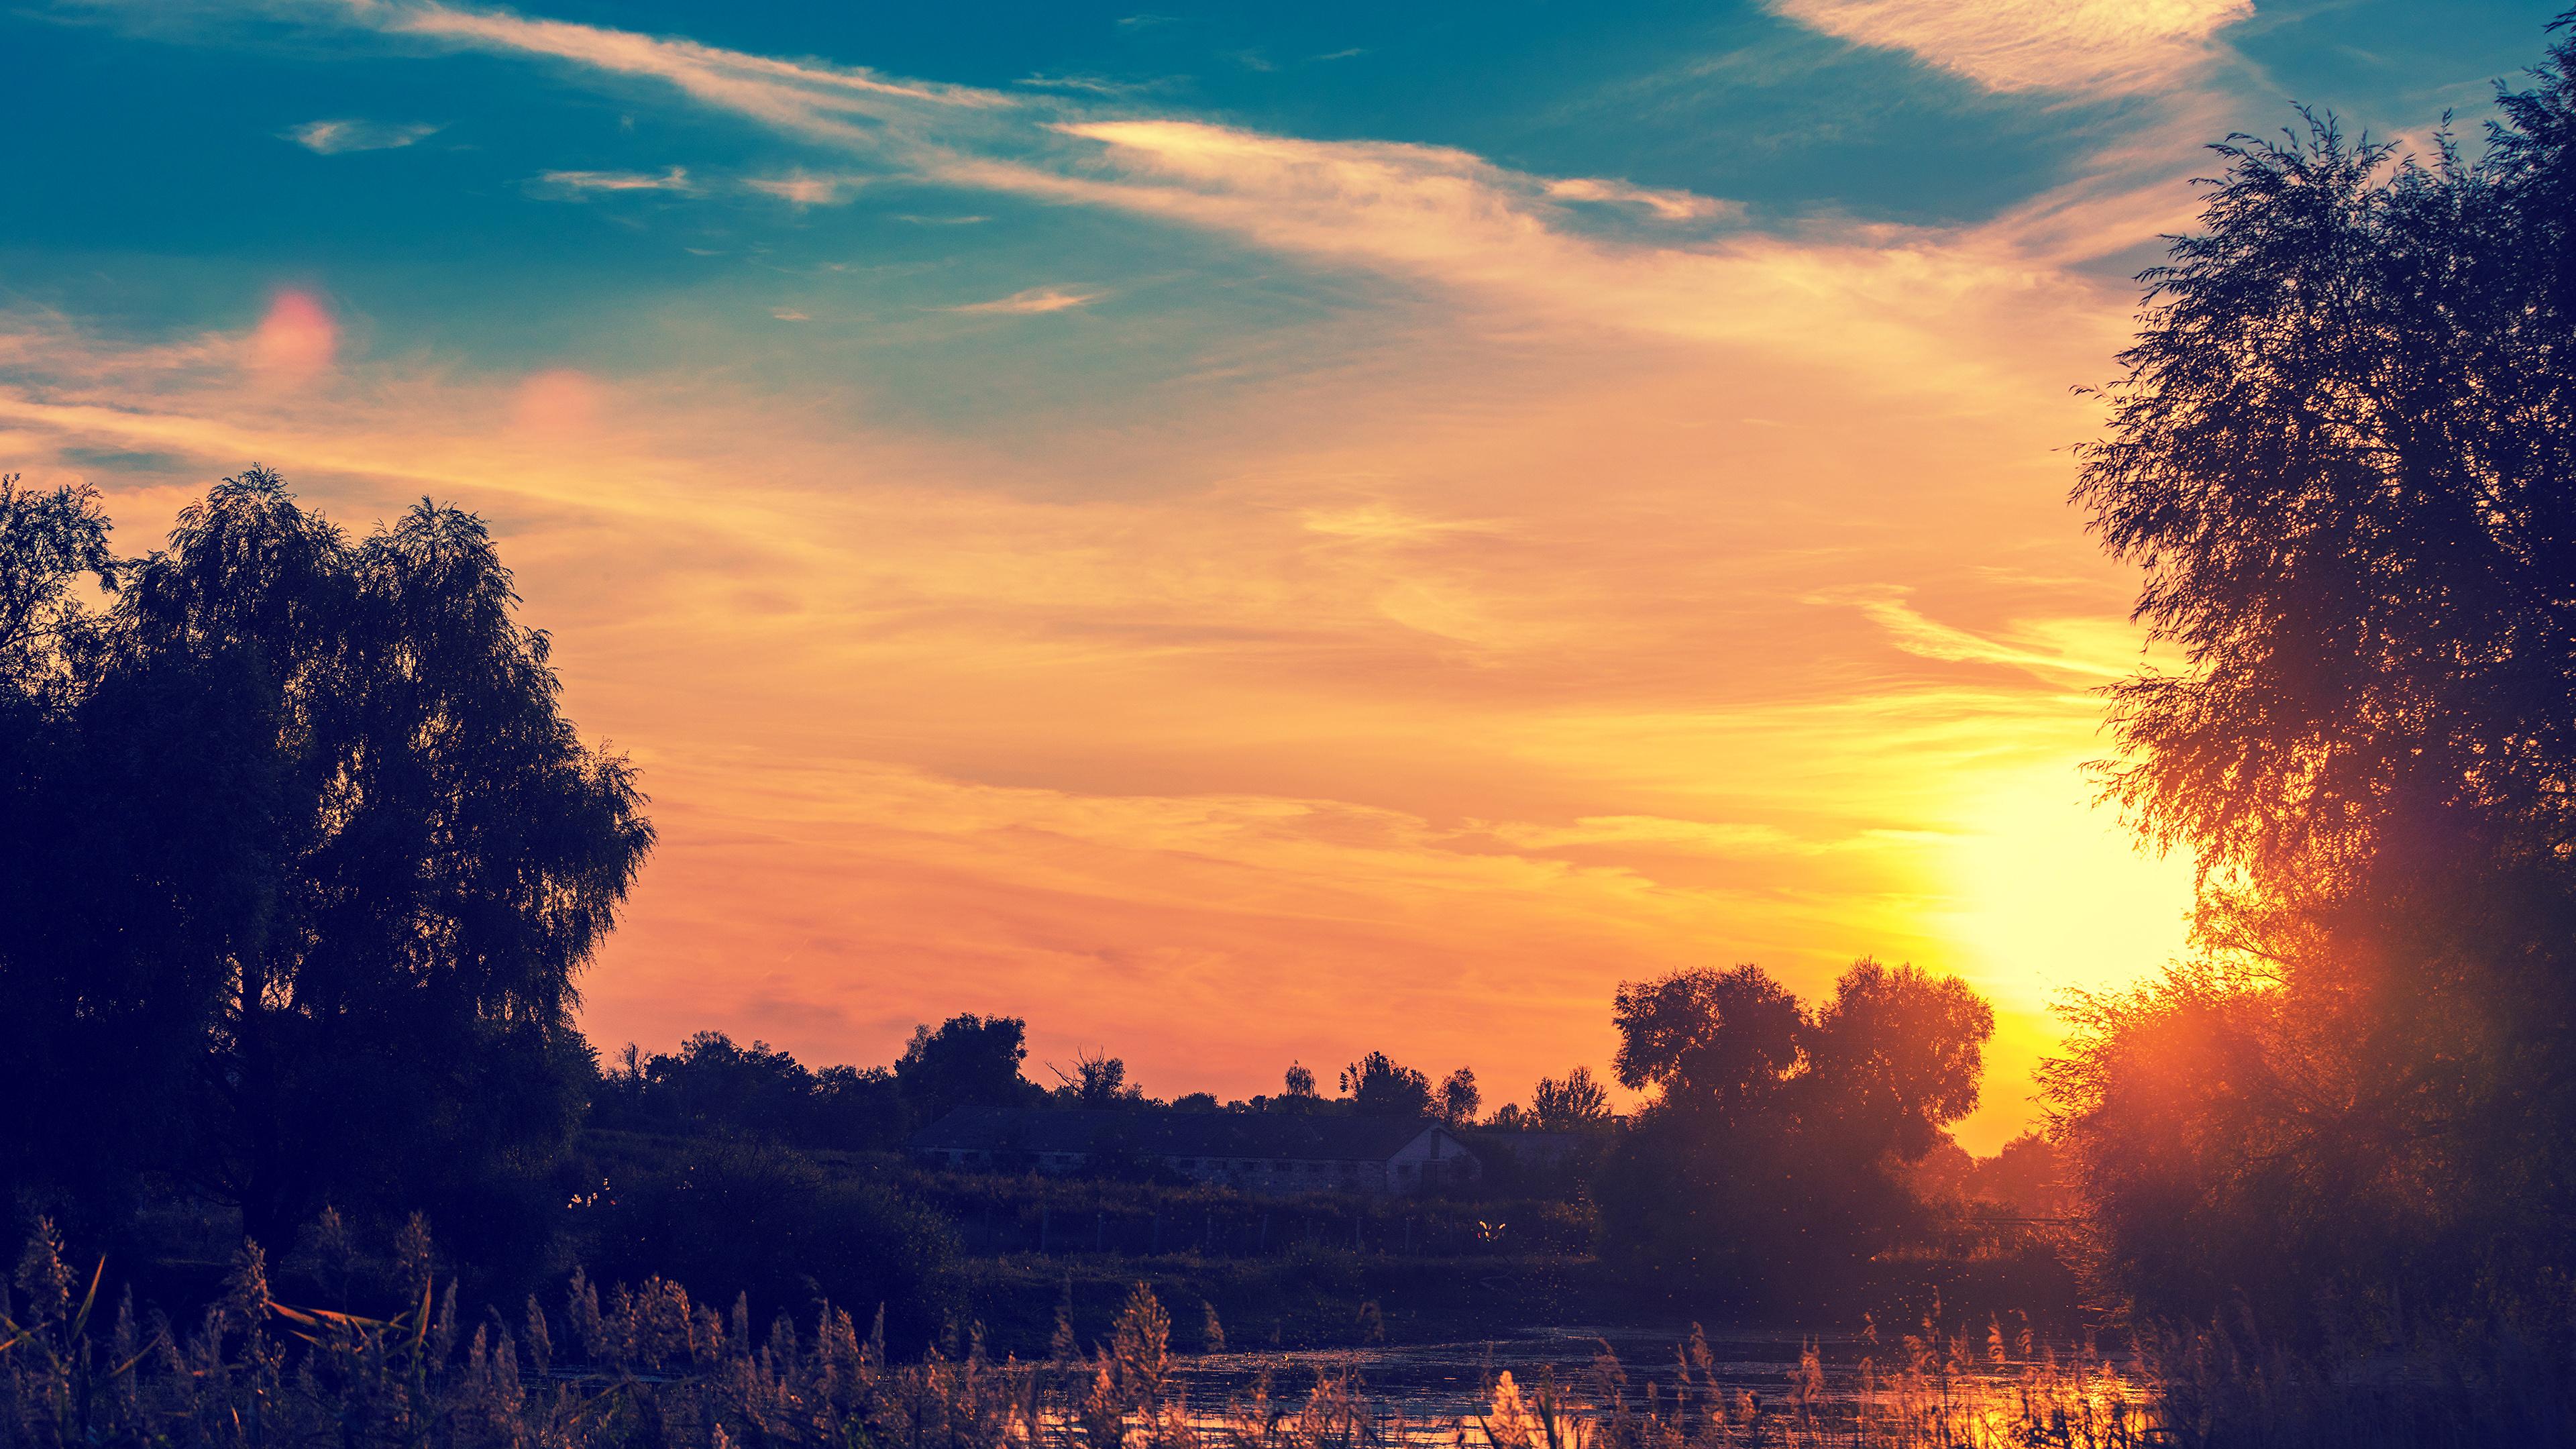 речка закат небо the river sunset sky в хорошем качестве